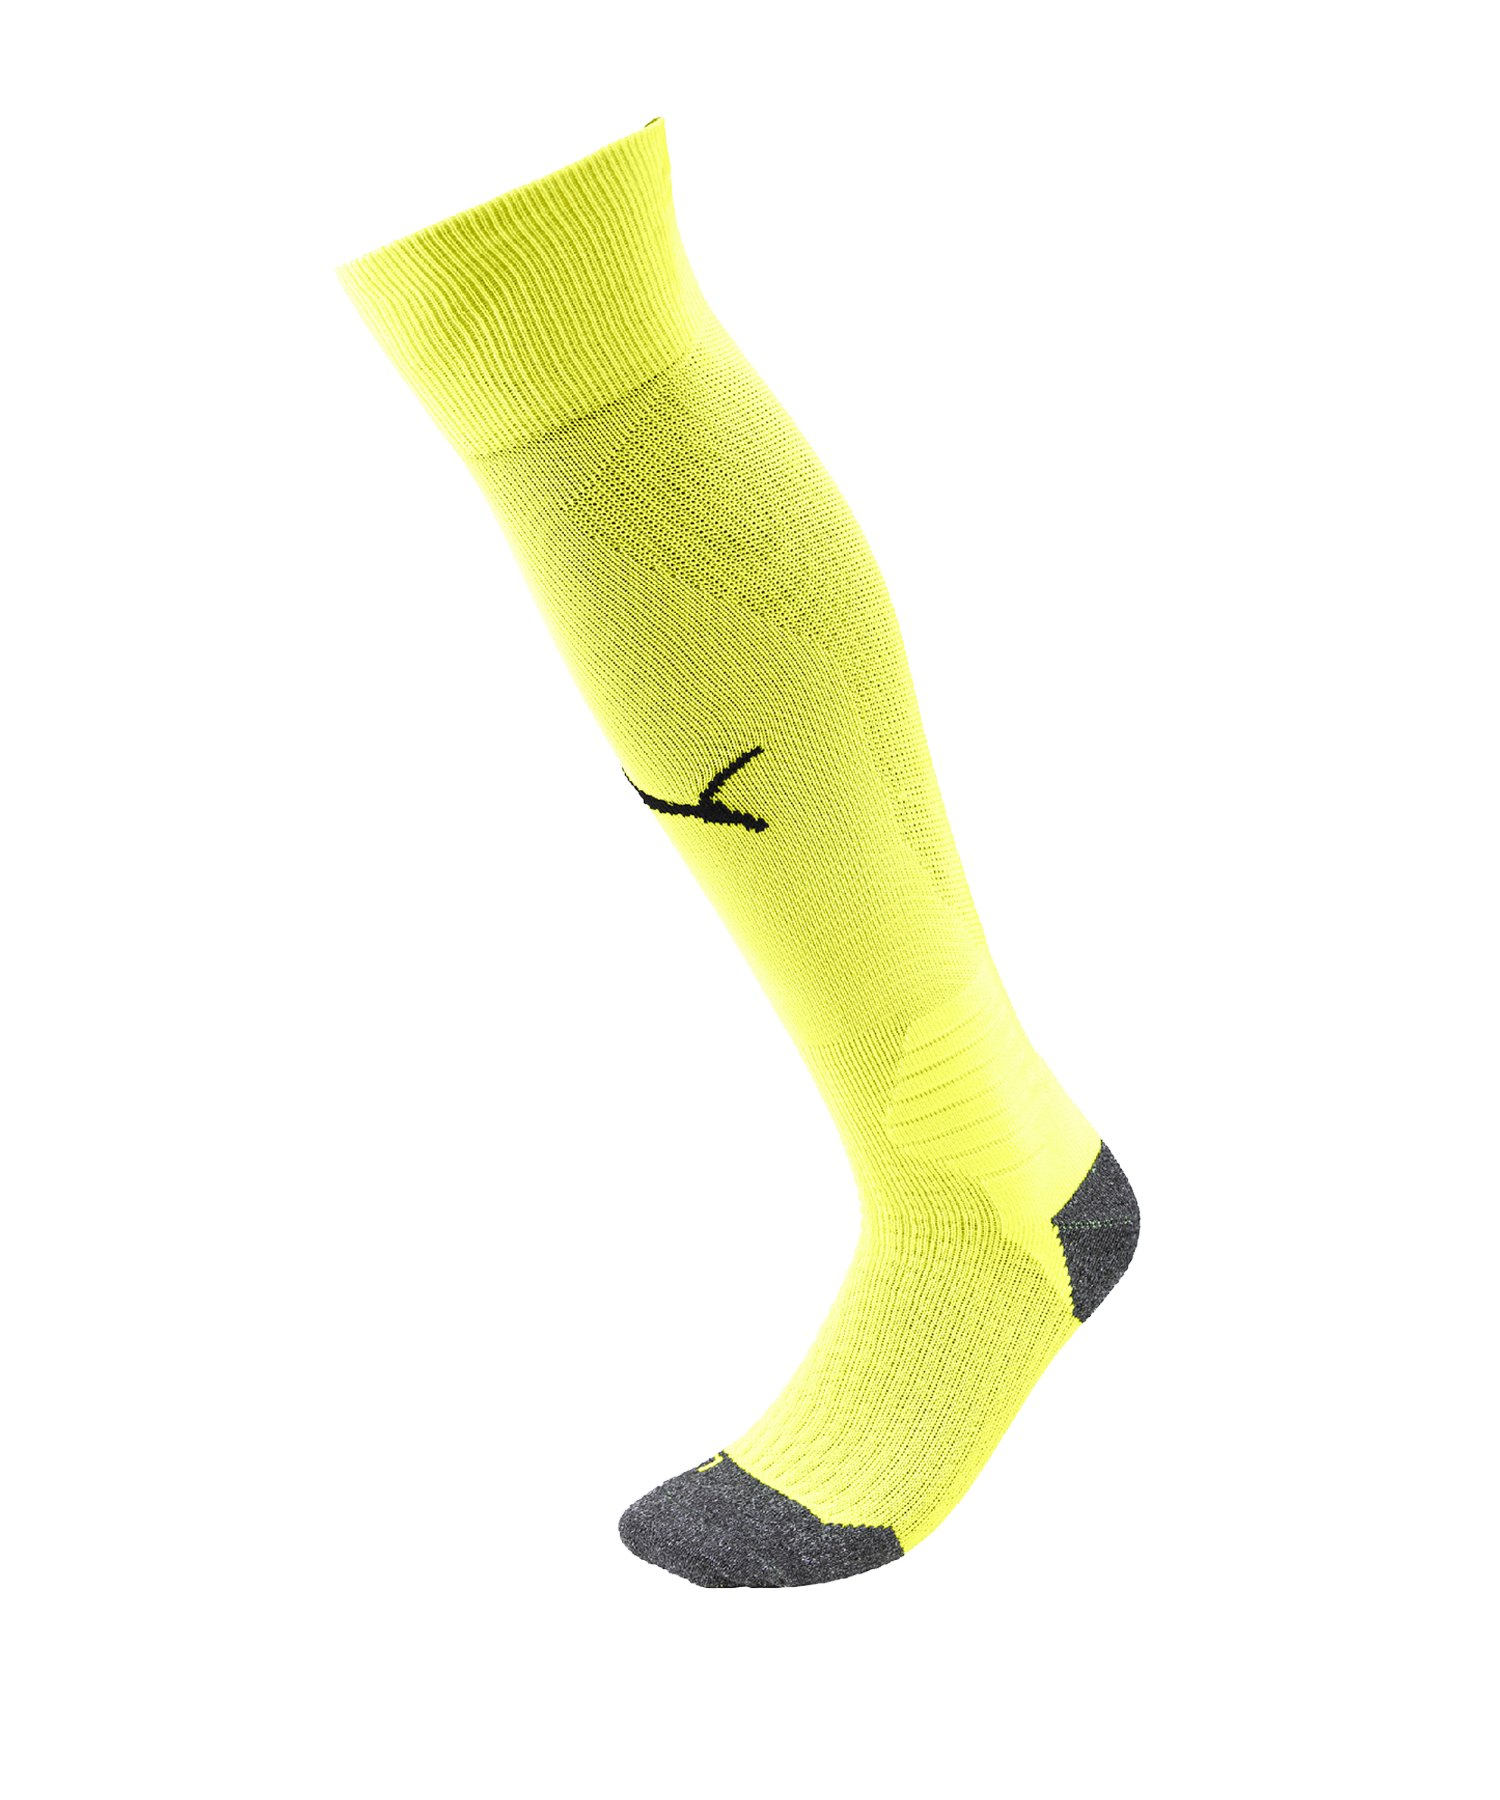 PUMA LIGA Socks Stutzenstrumpf Gelb Schwarz F46 - Gelb